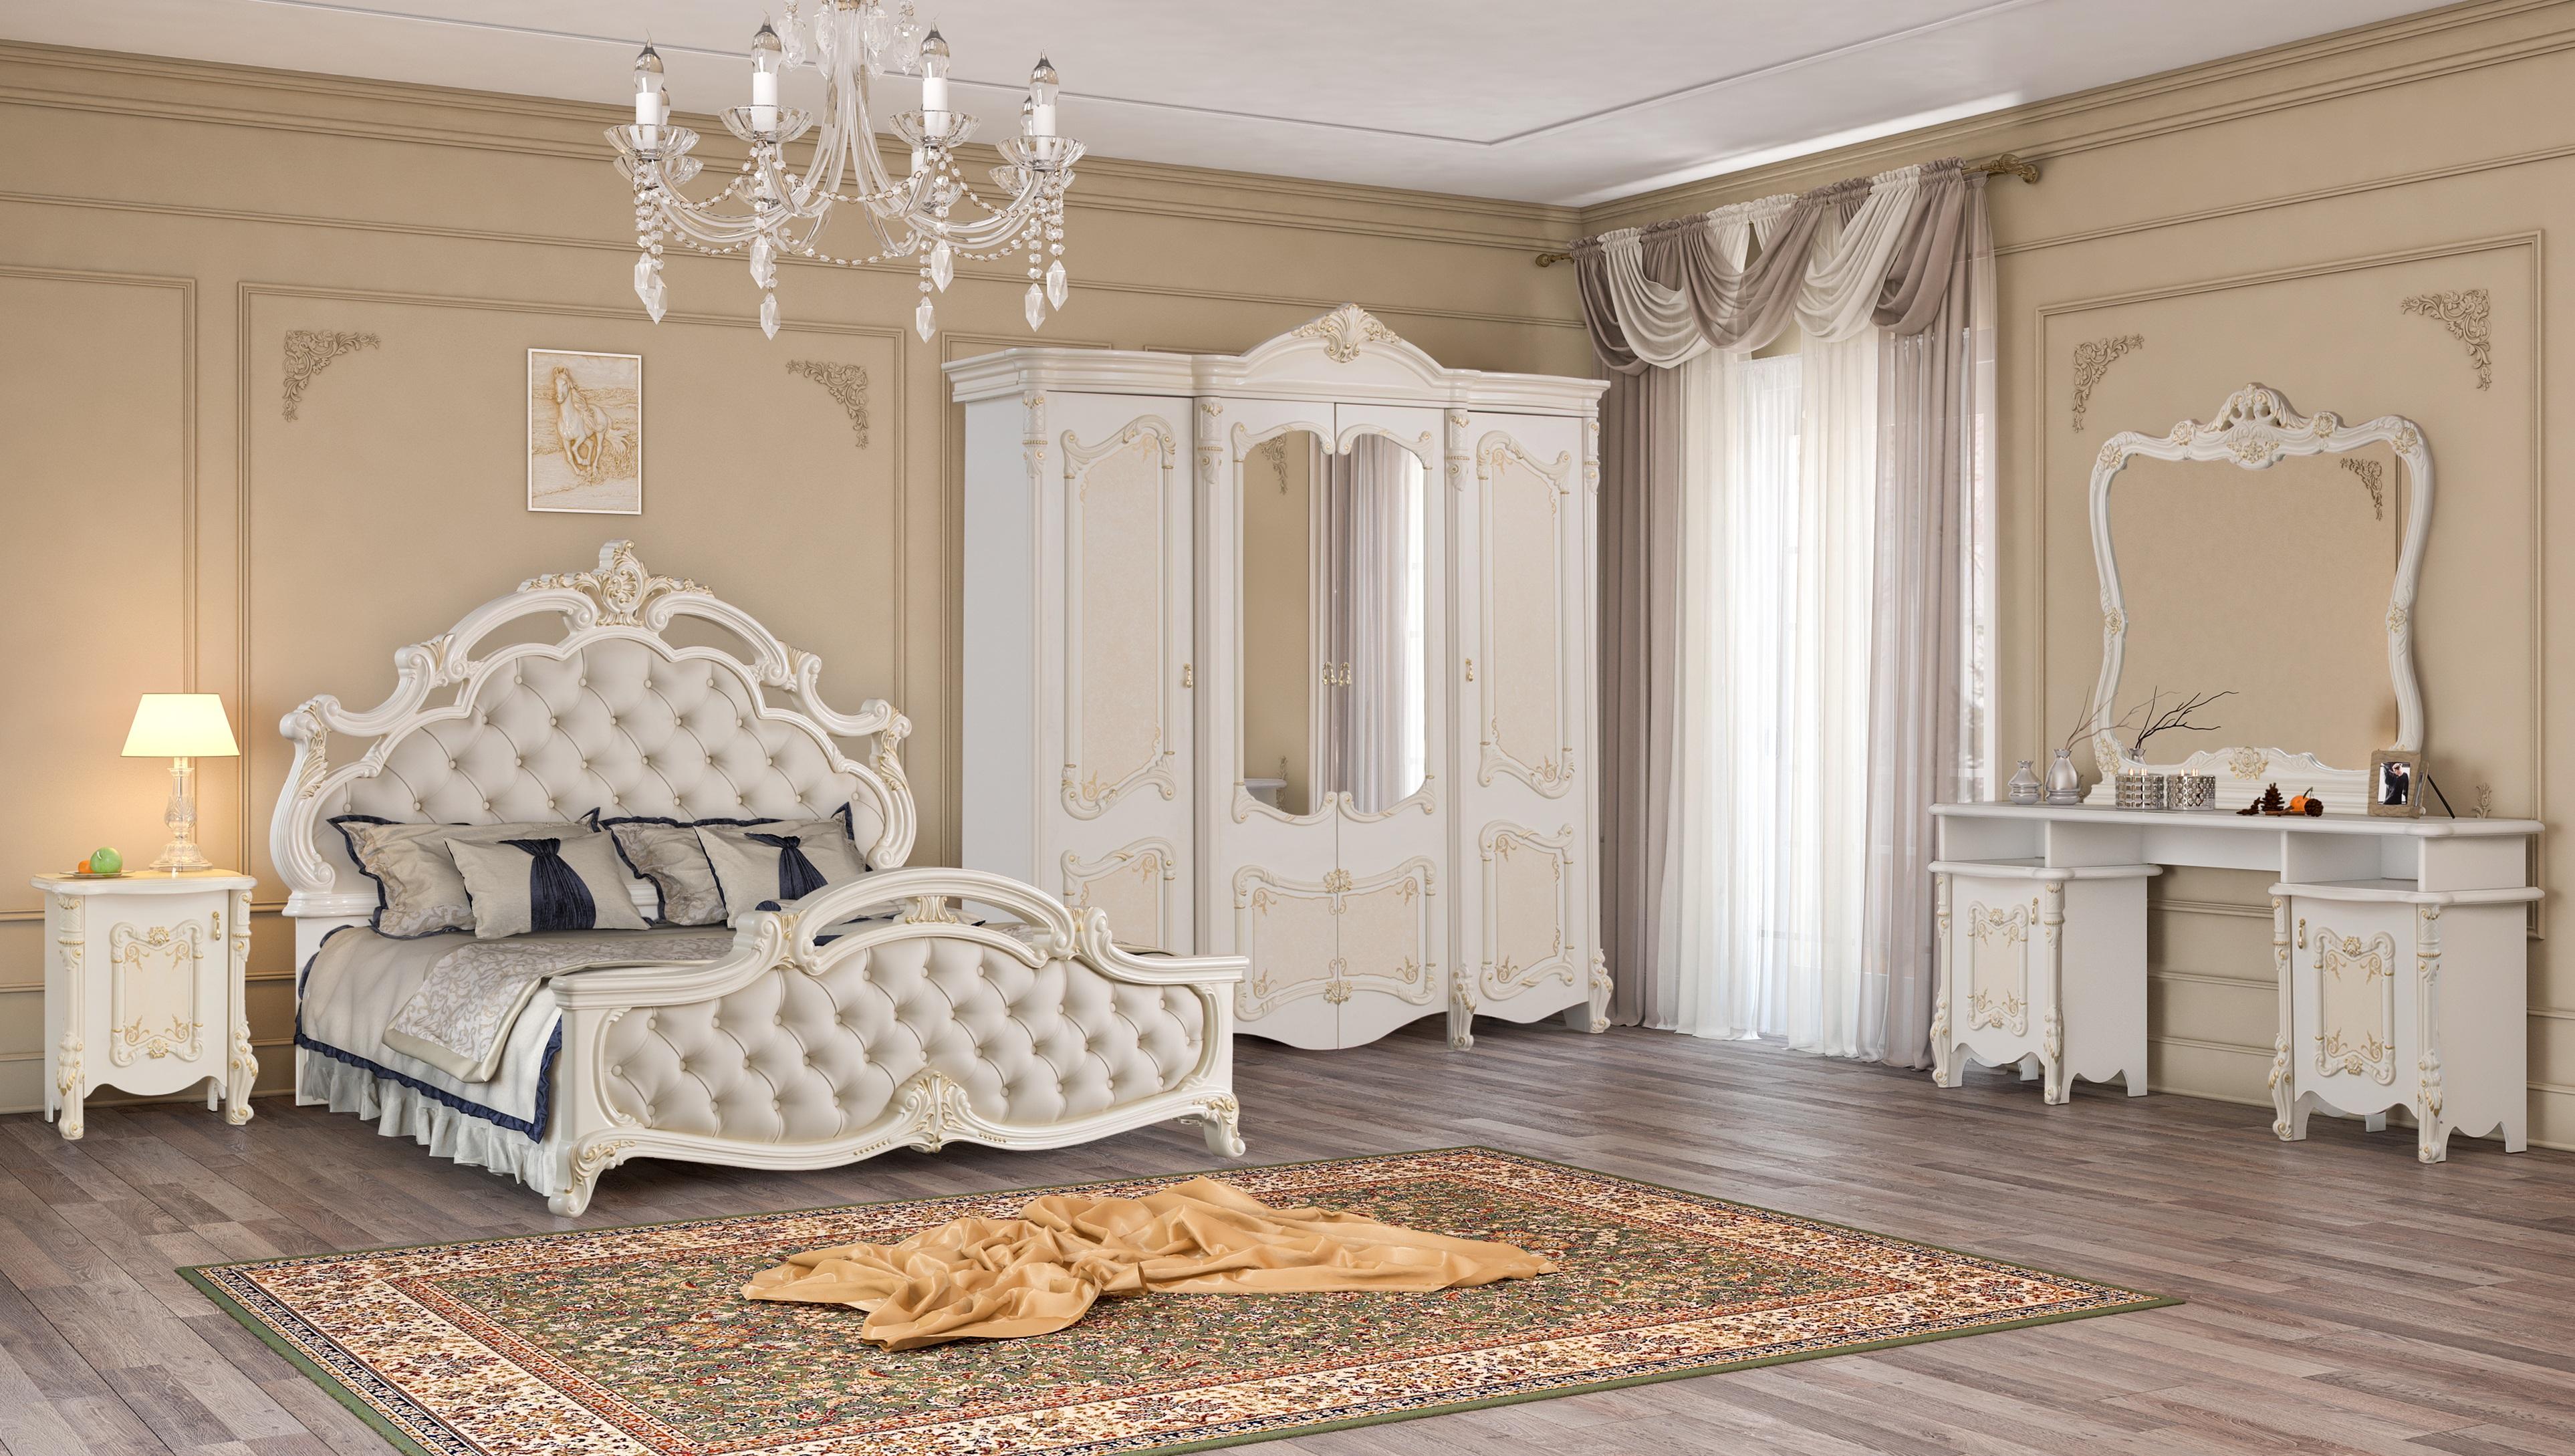 Спальня Рафаэлла беж, фабрика Диа-мебель